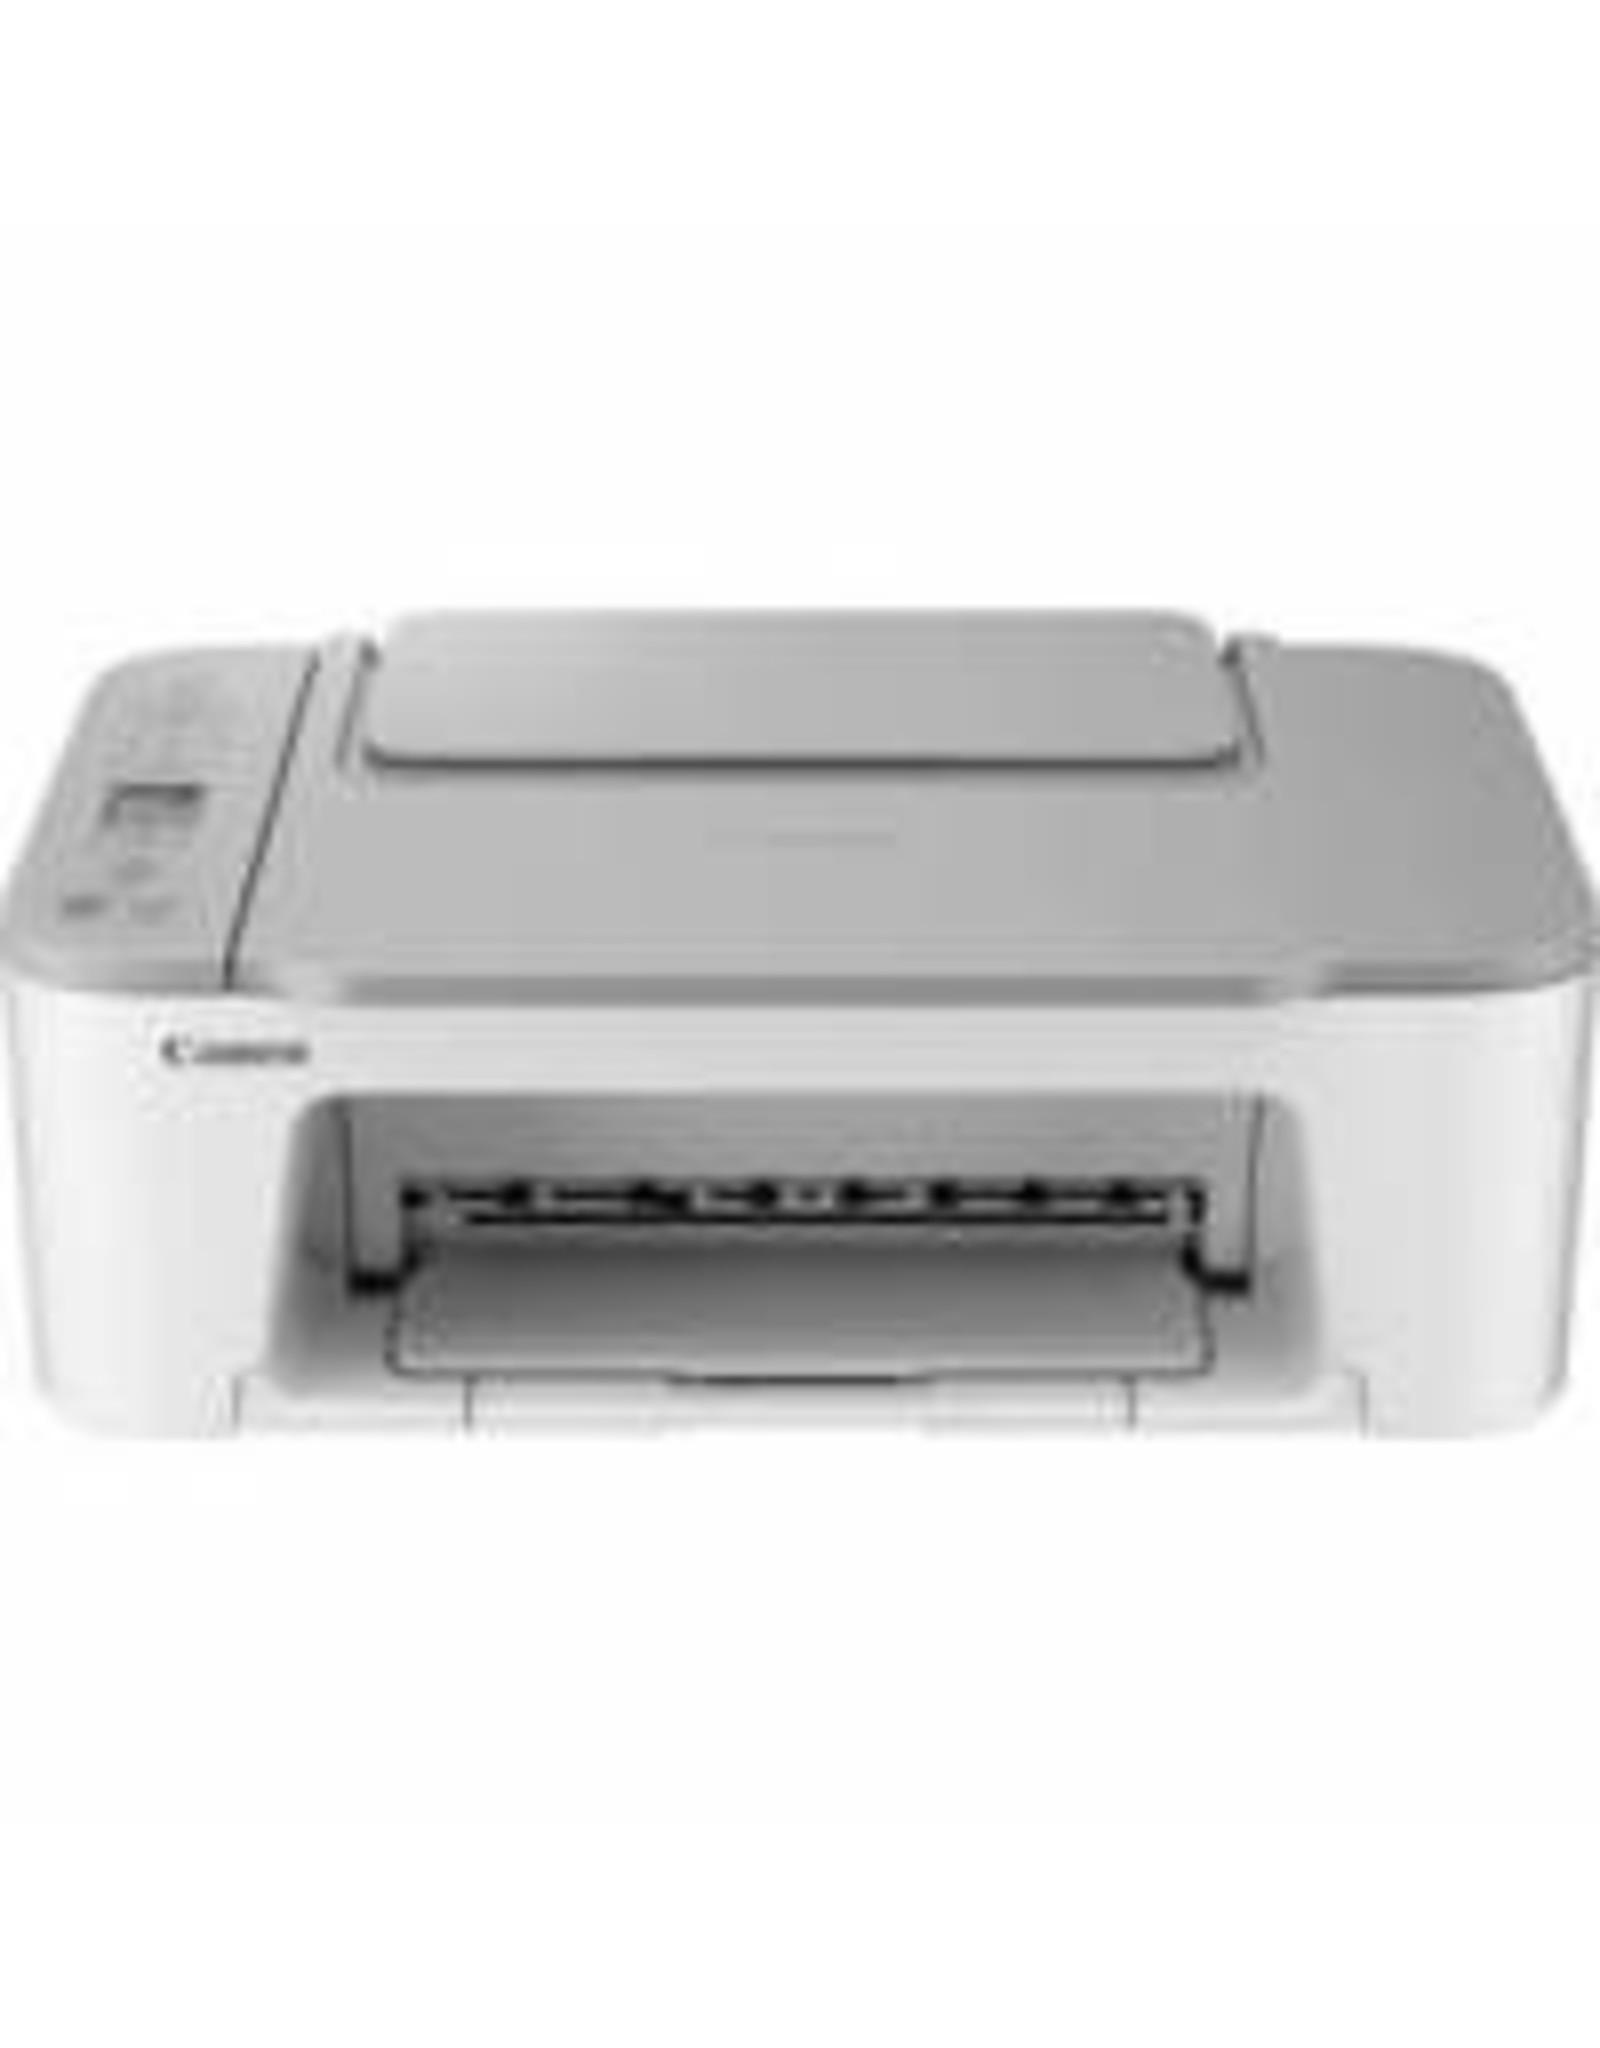 Canon PIXMA TS3451 AIO / Copy / Print / Scan / WiFi / Wit